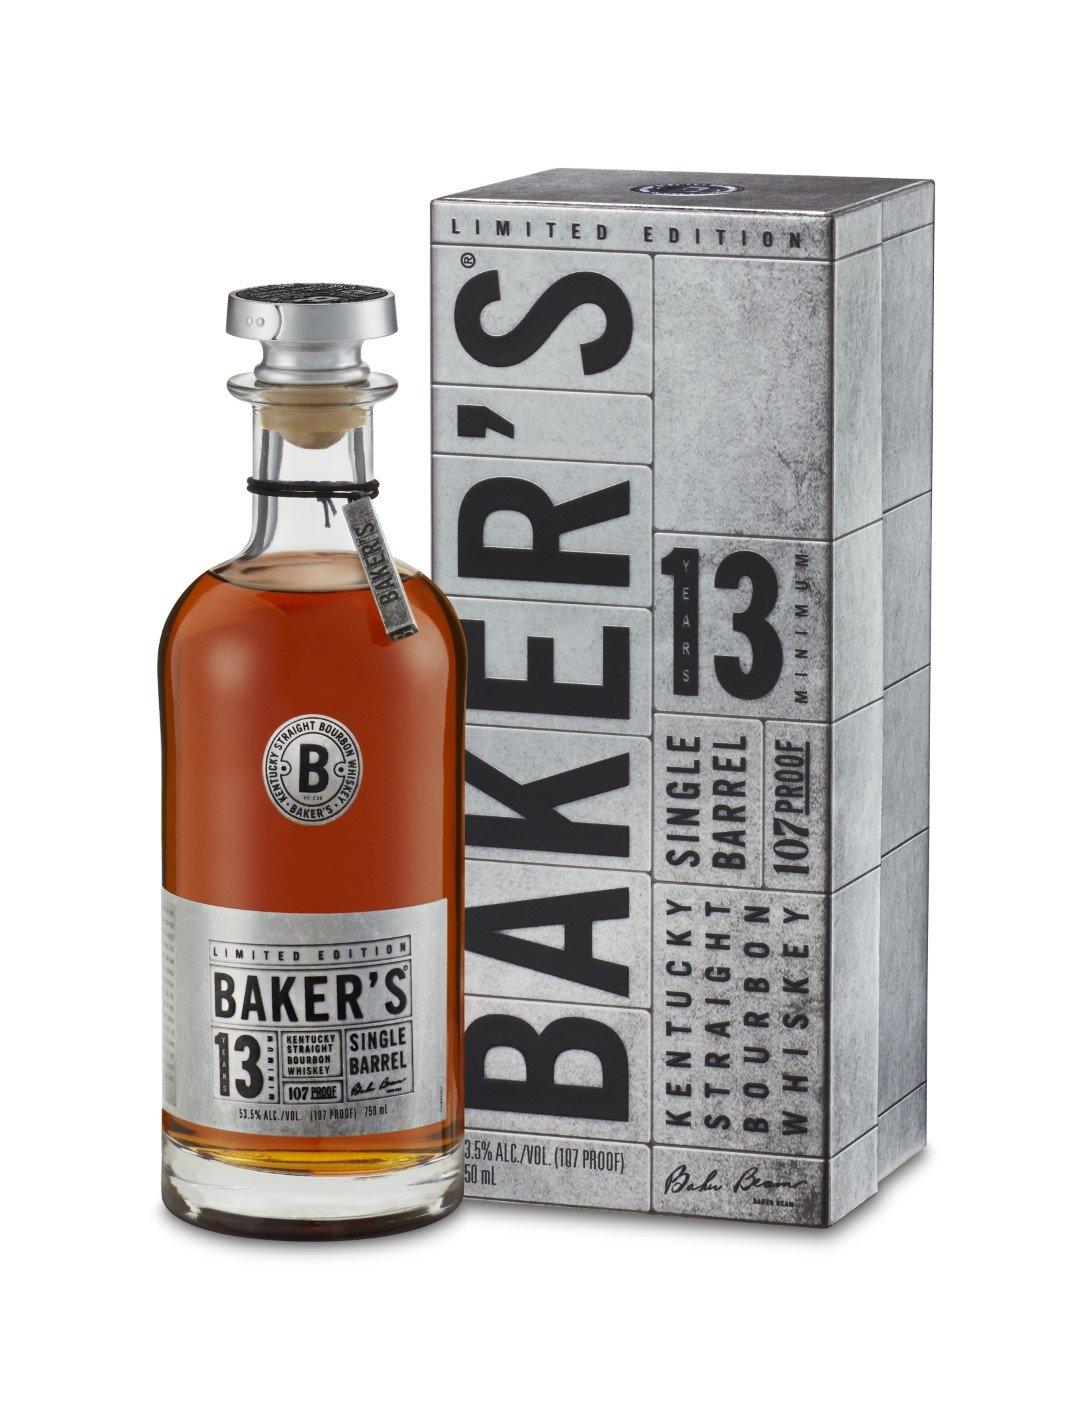 Baker's Bourbon Single Barrel 13 Years Old (2019)